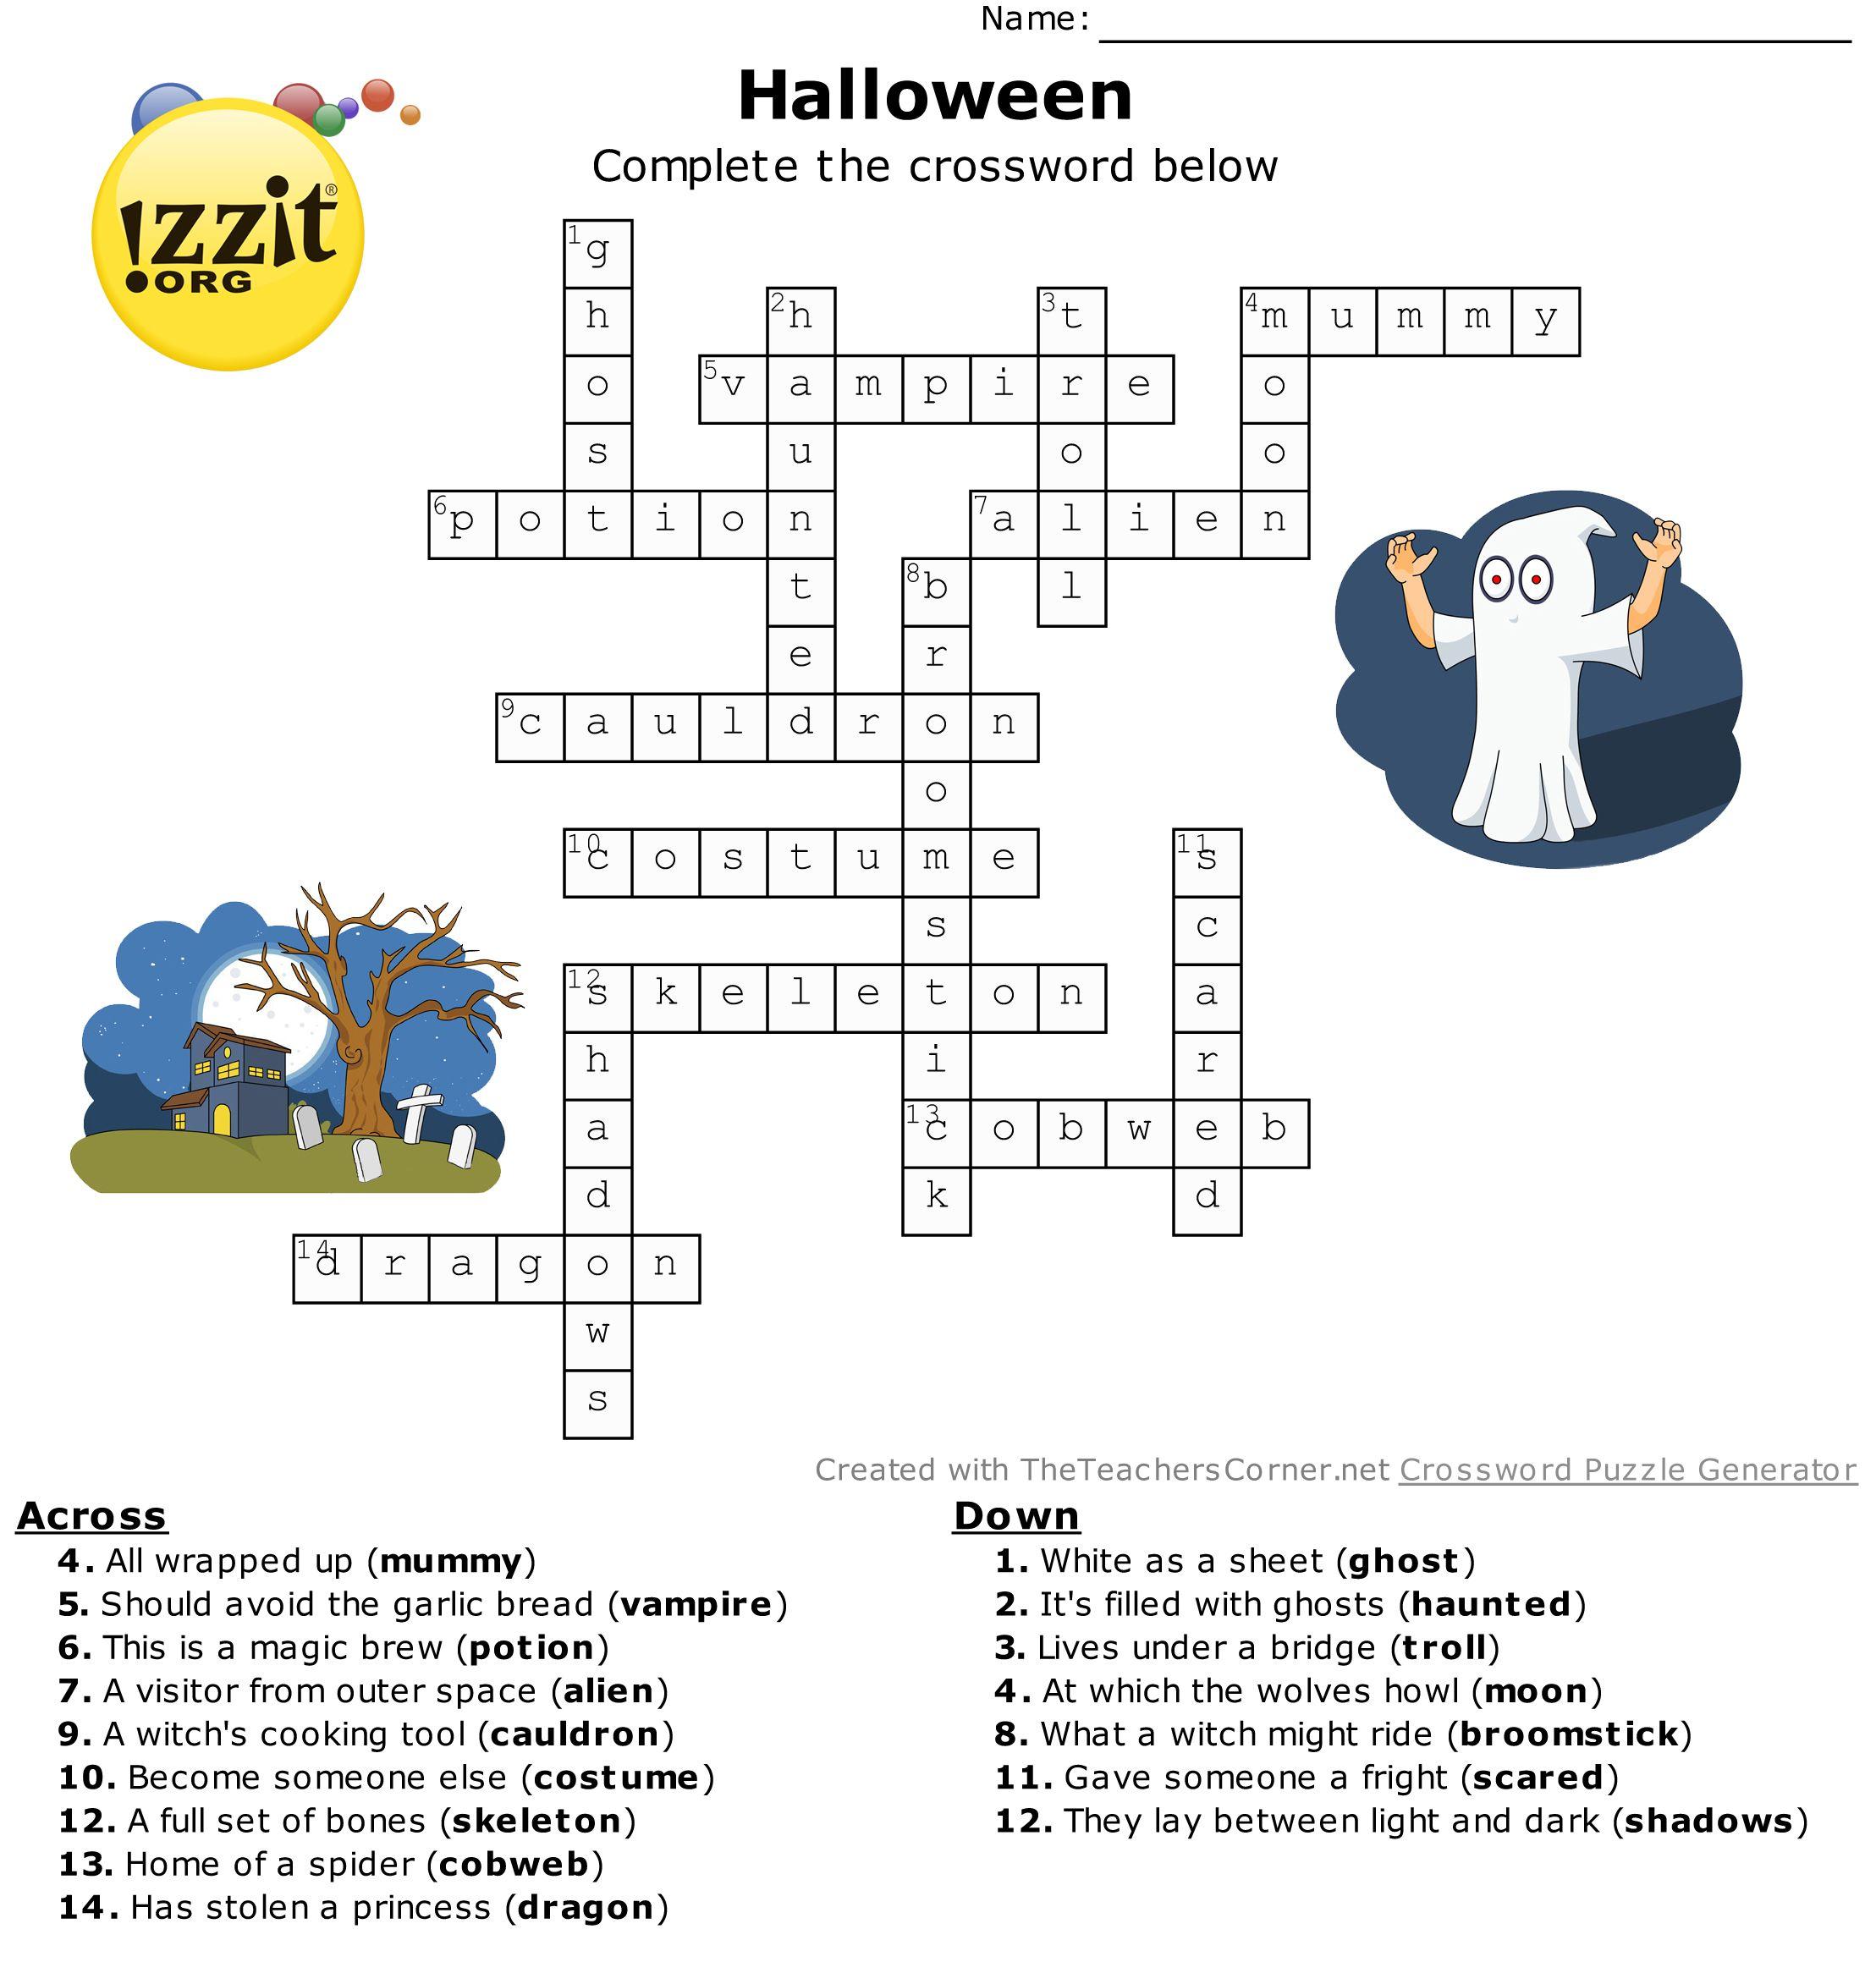 Halloween Crossword Answers